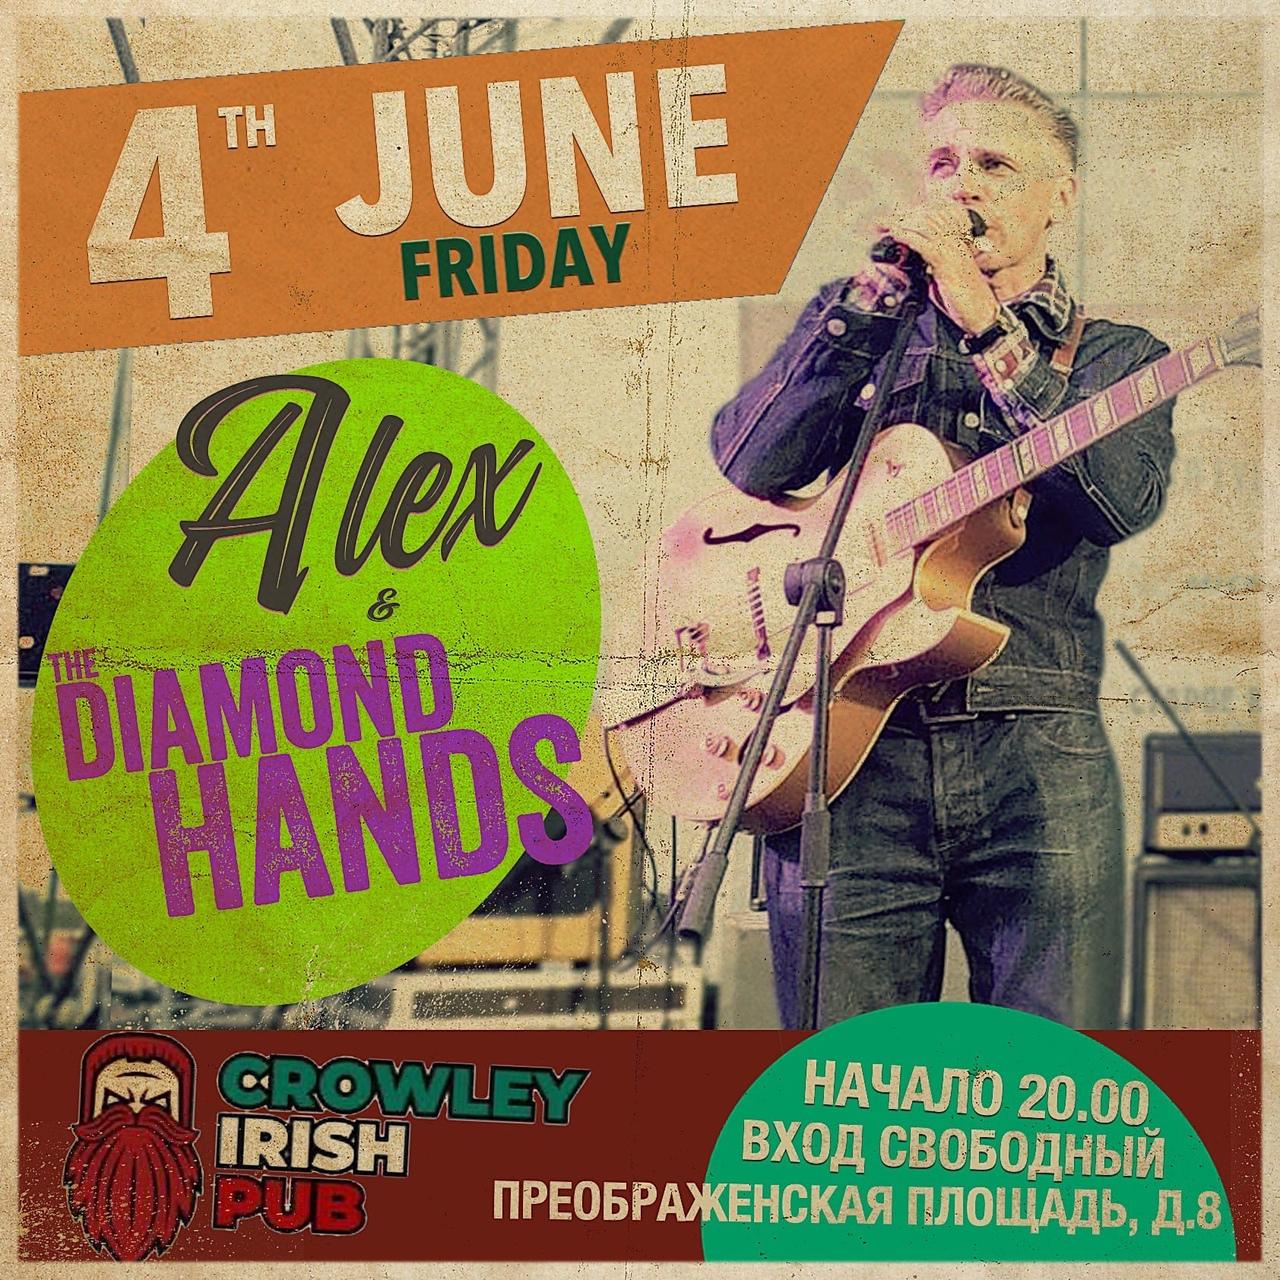 04.06 Alex & The Diamond Hands в Crowley Irish Pub!!!